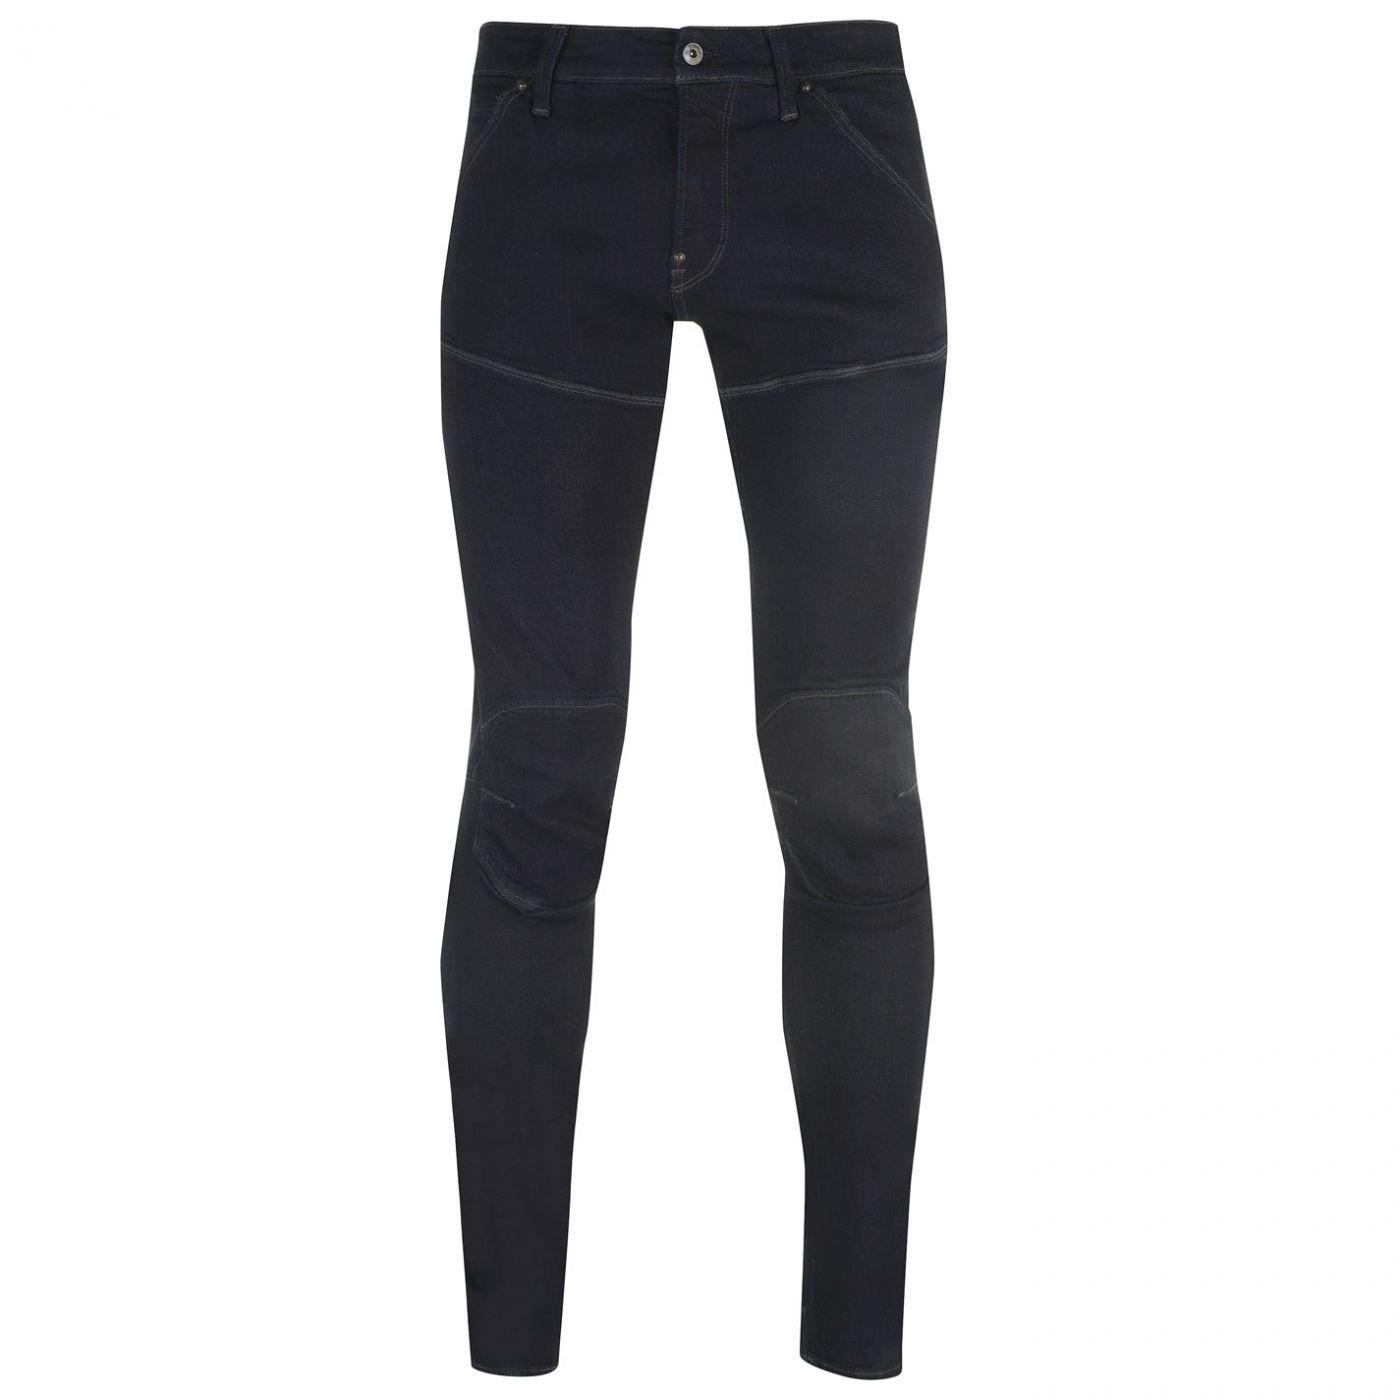 G Star 51027 Jeans